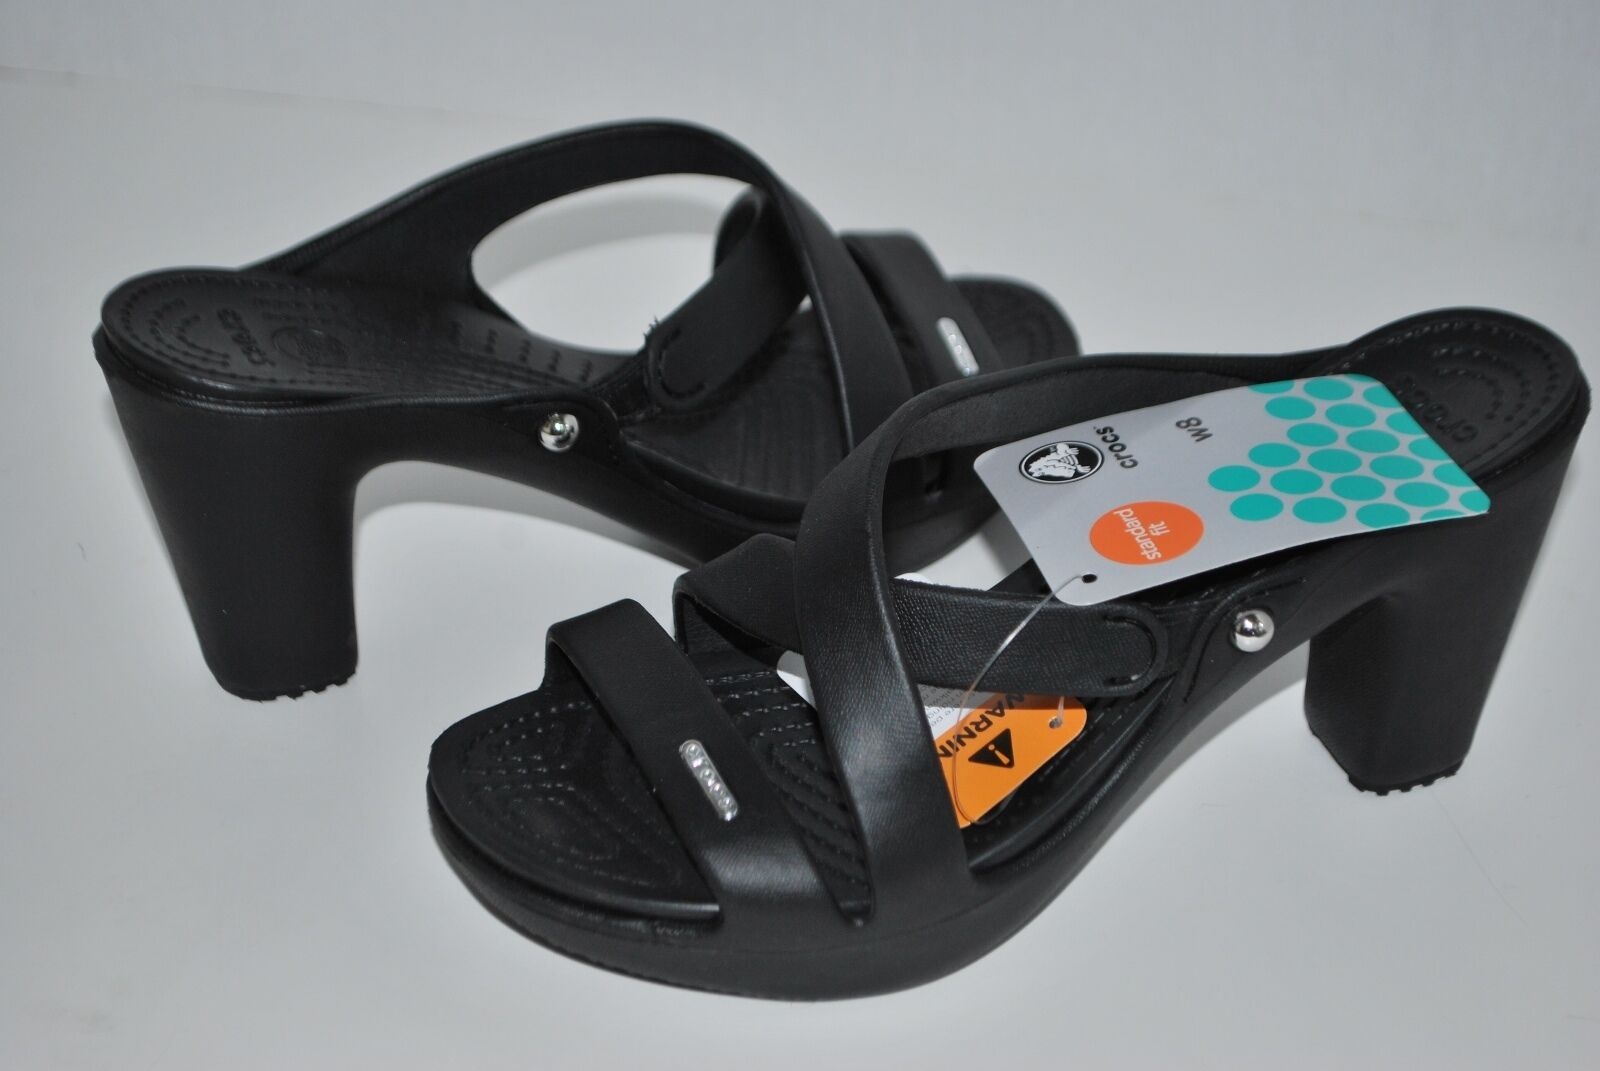 NWT CROCS CYPRUS IV BLACK ESPRESSO BROWN LEOPARD shoe Sandales heels shoe LEOPARD 7 8 9 10 wmn 49cbaf